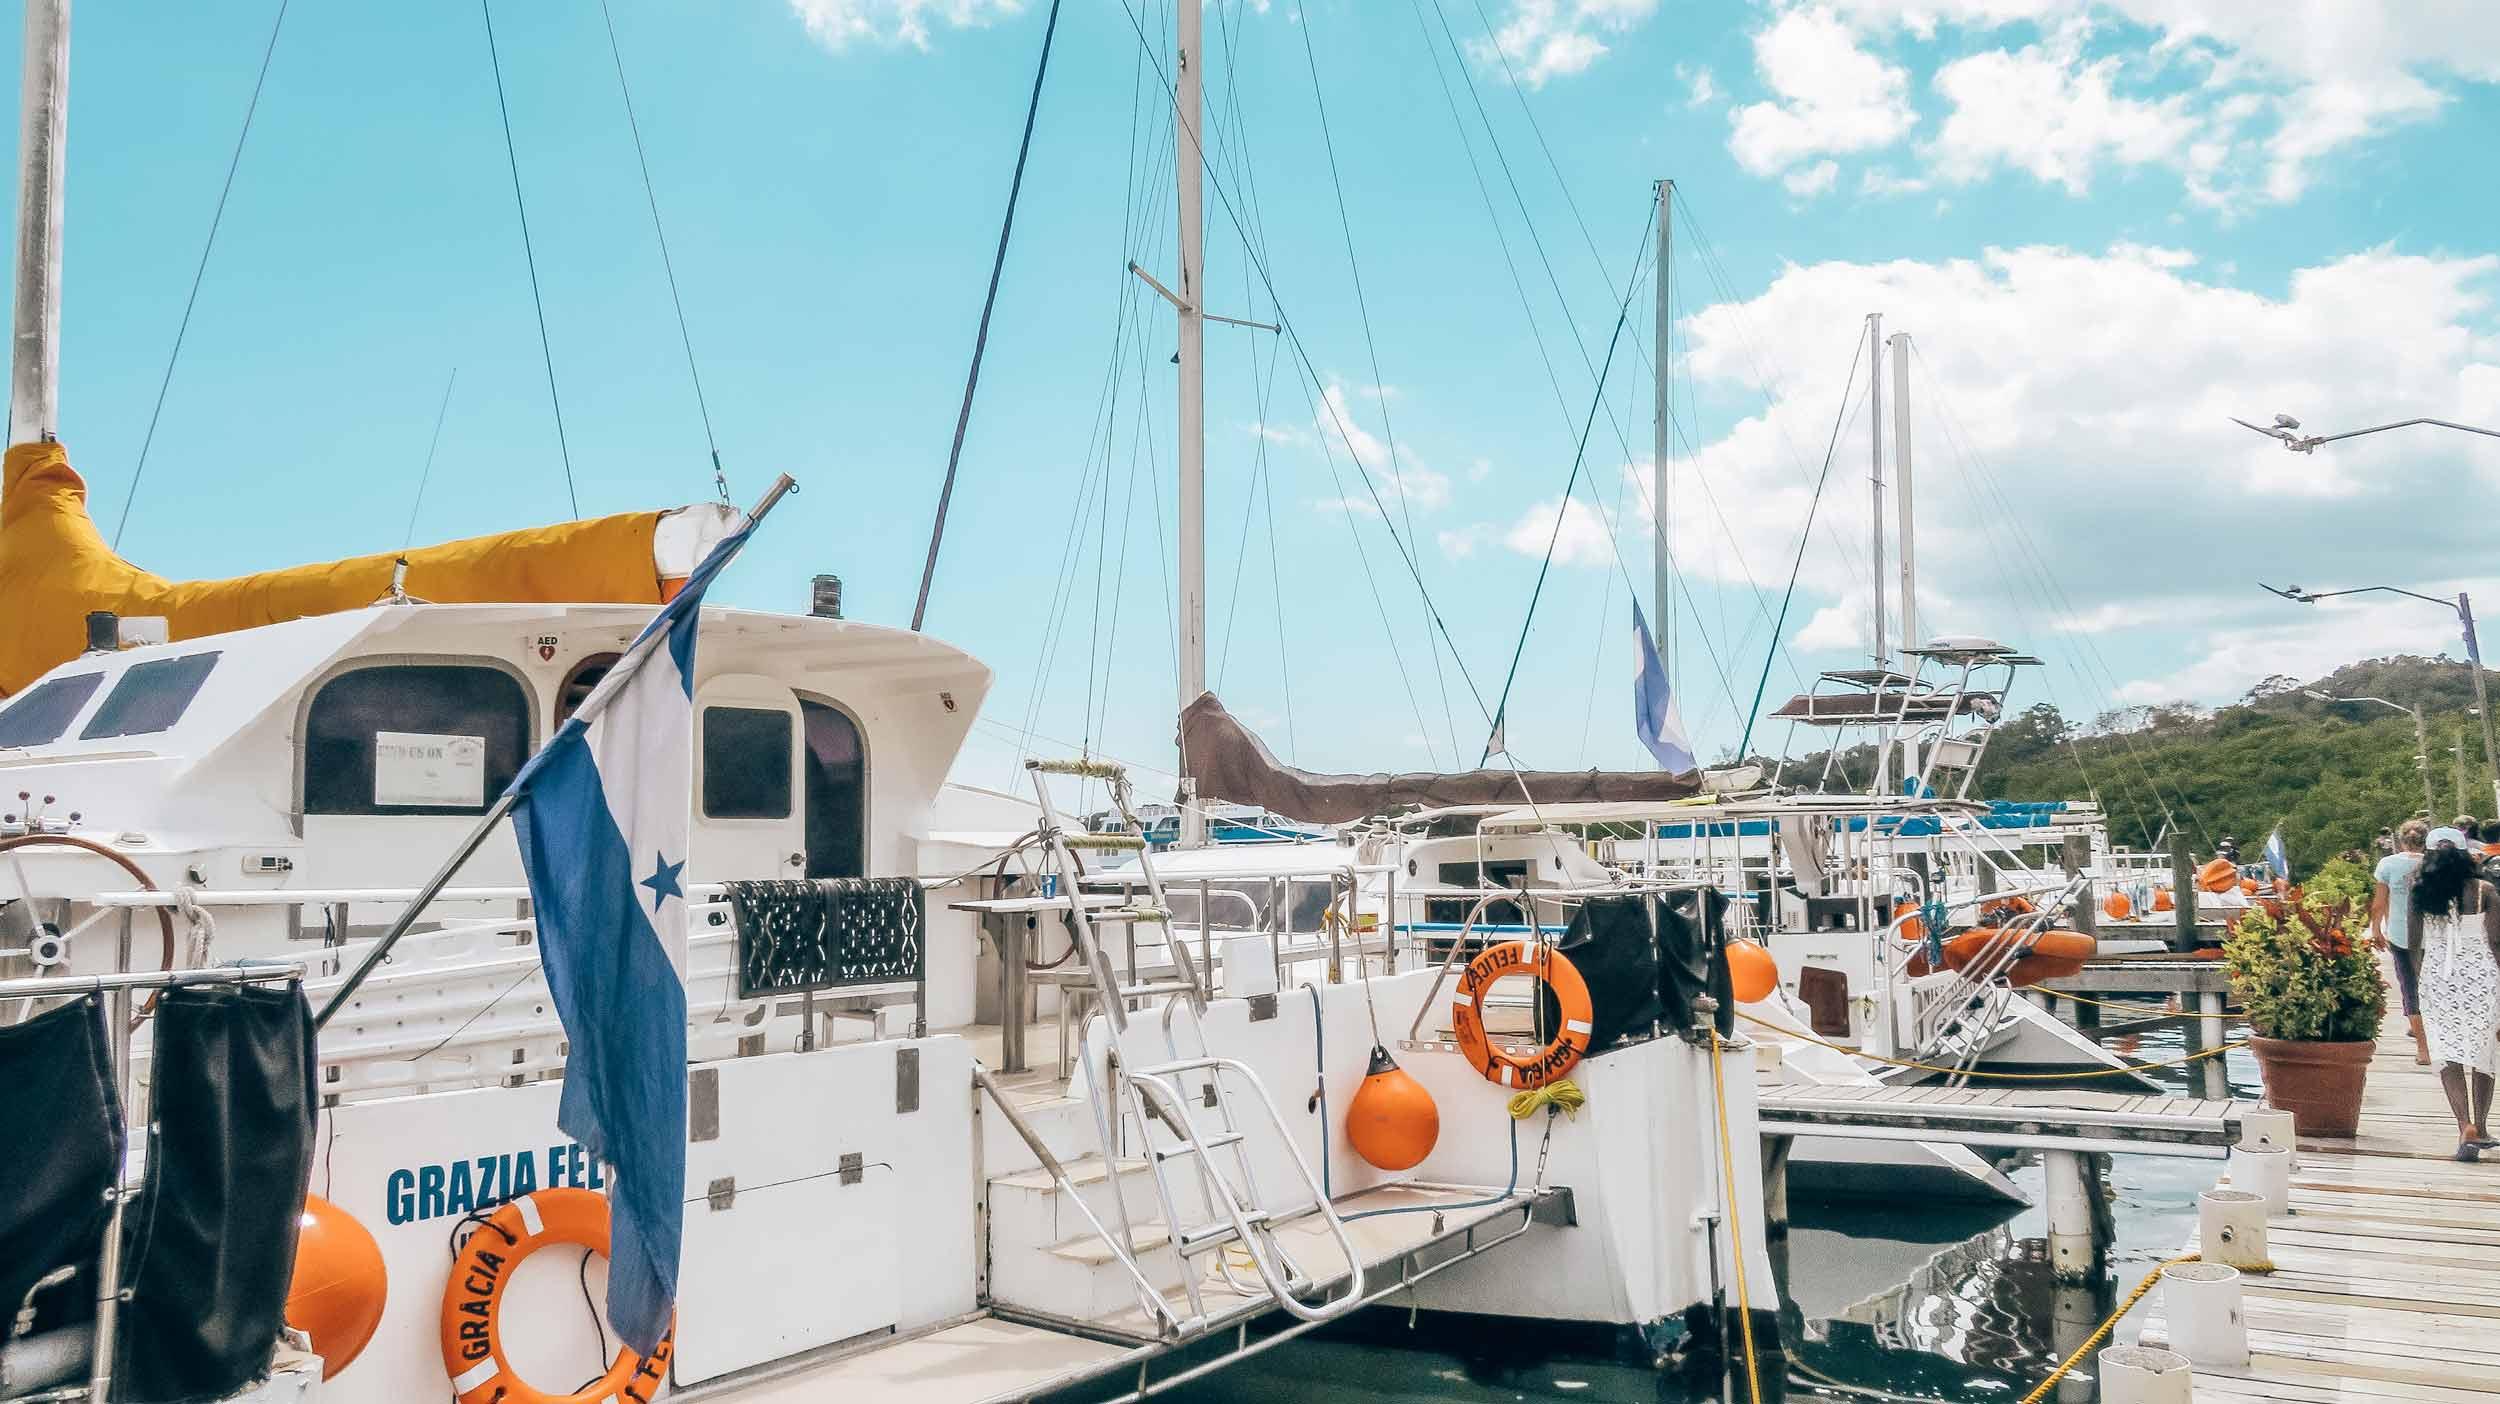 Mittelamerika-Kreuzfahrt-Roatan-Honduras-Ausflug-Hafen-2